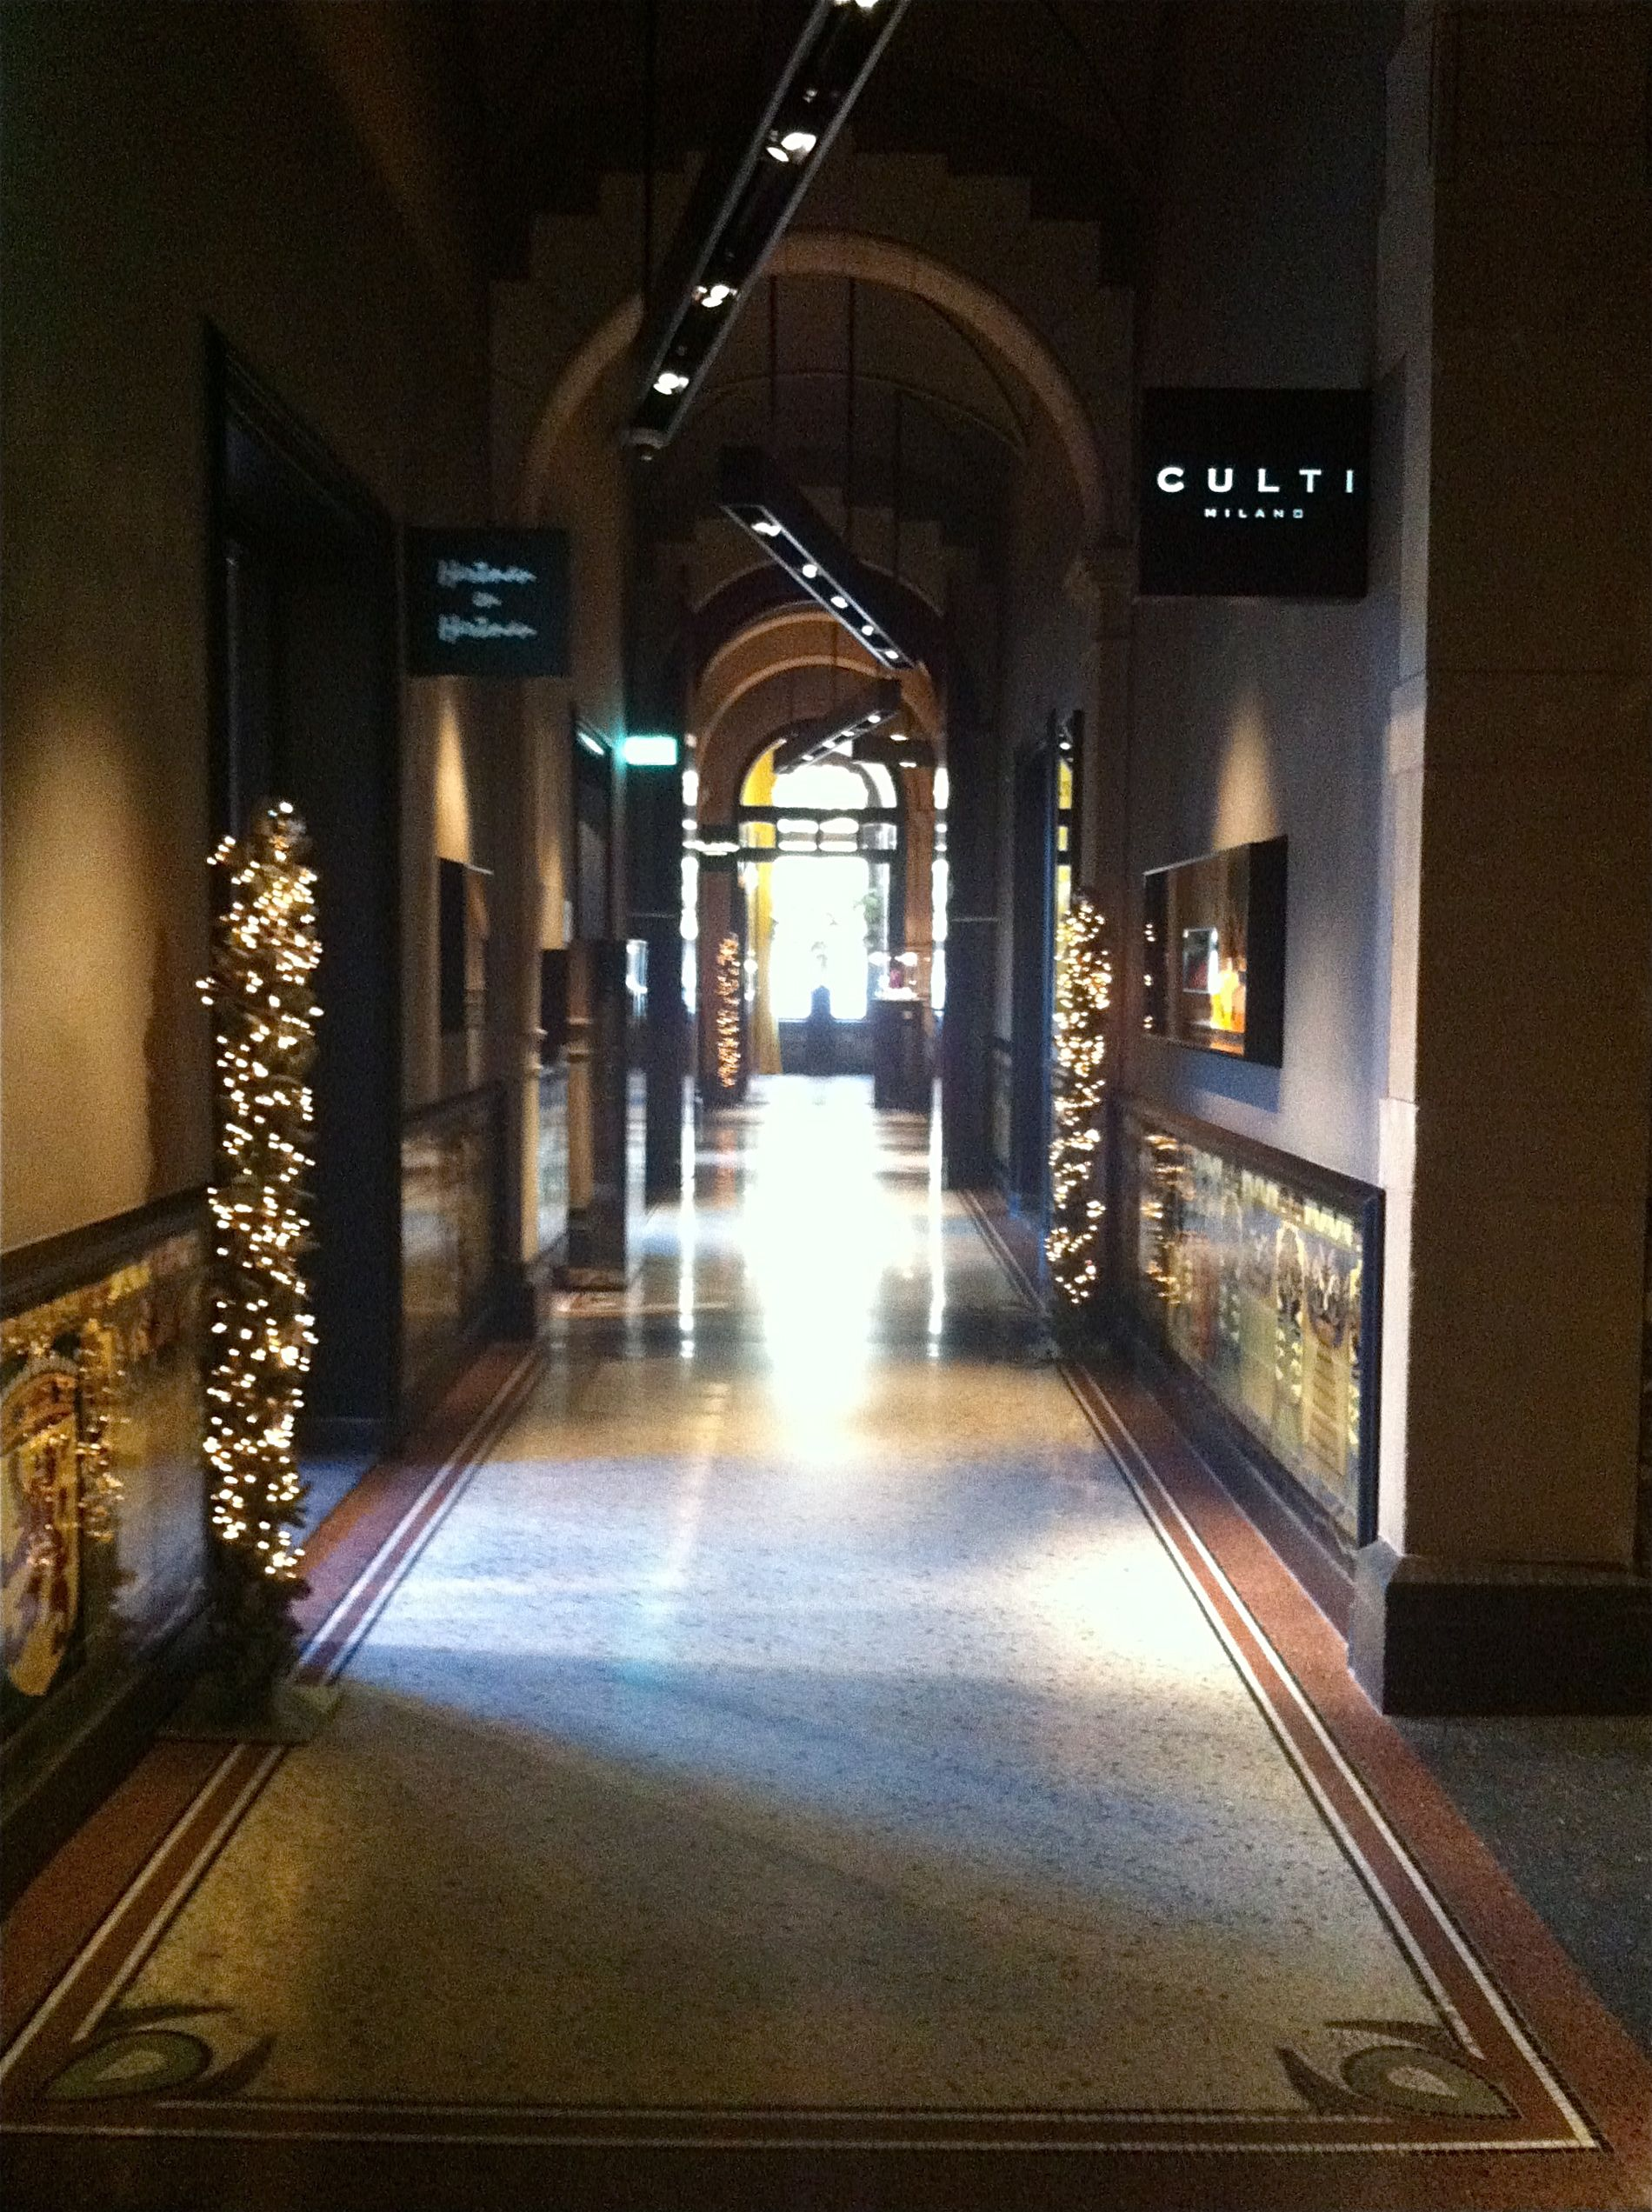 Shopping Arcade Conservatorium Hotel Amsterdam